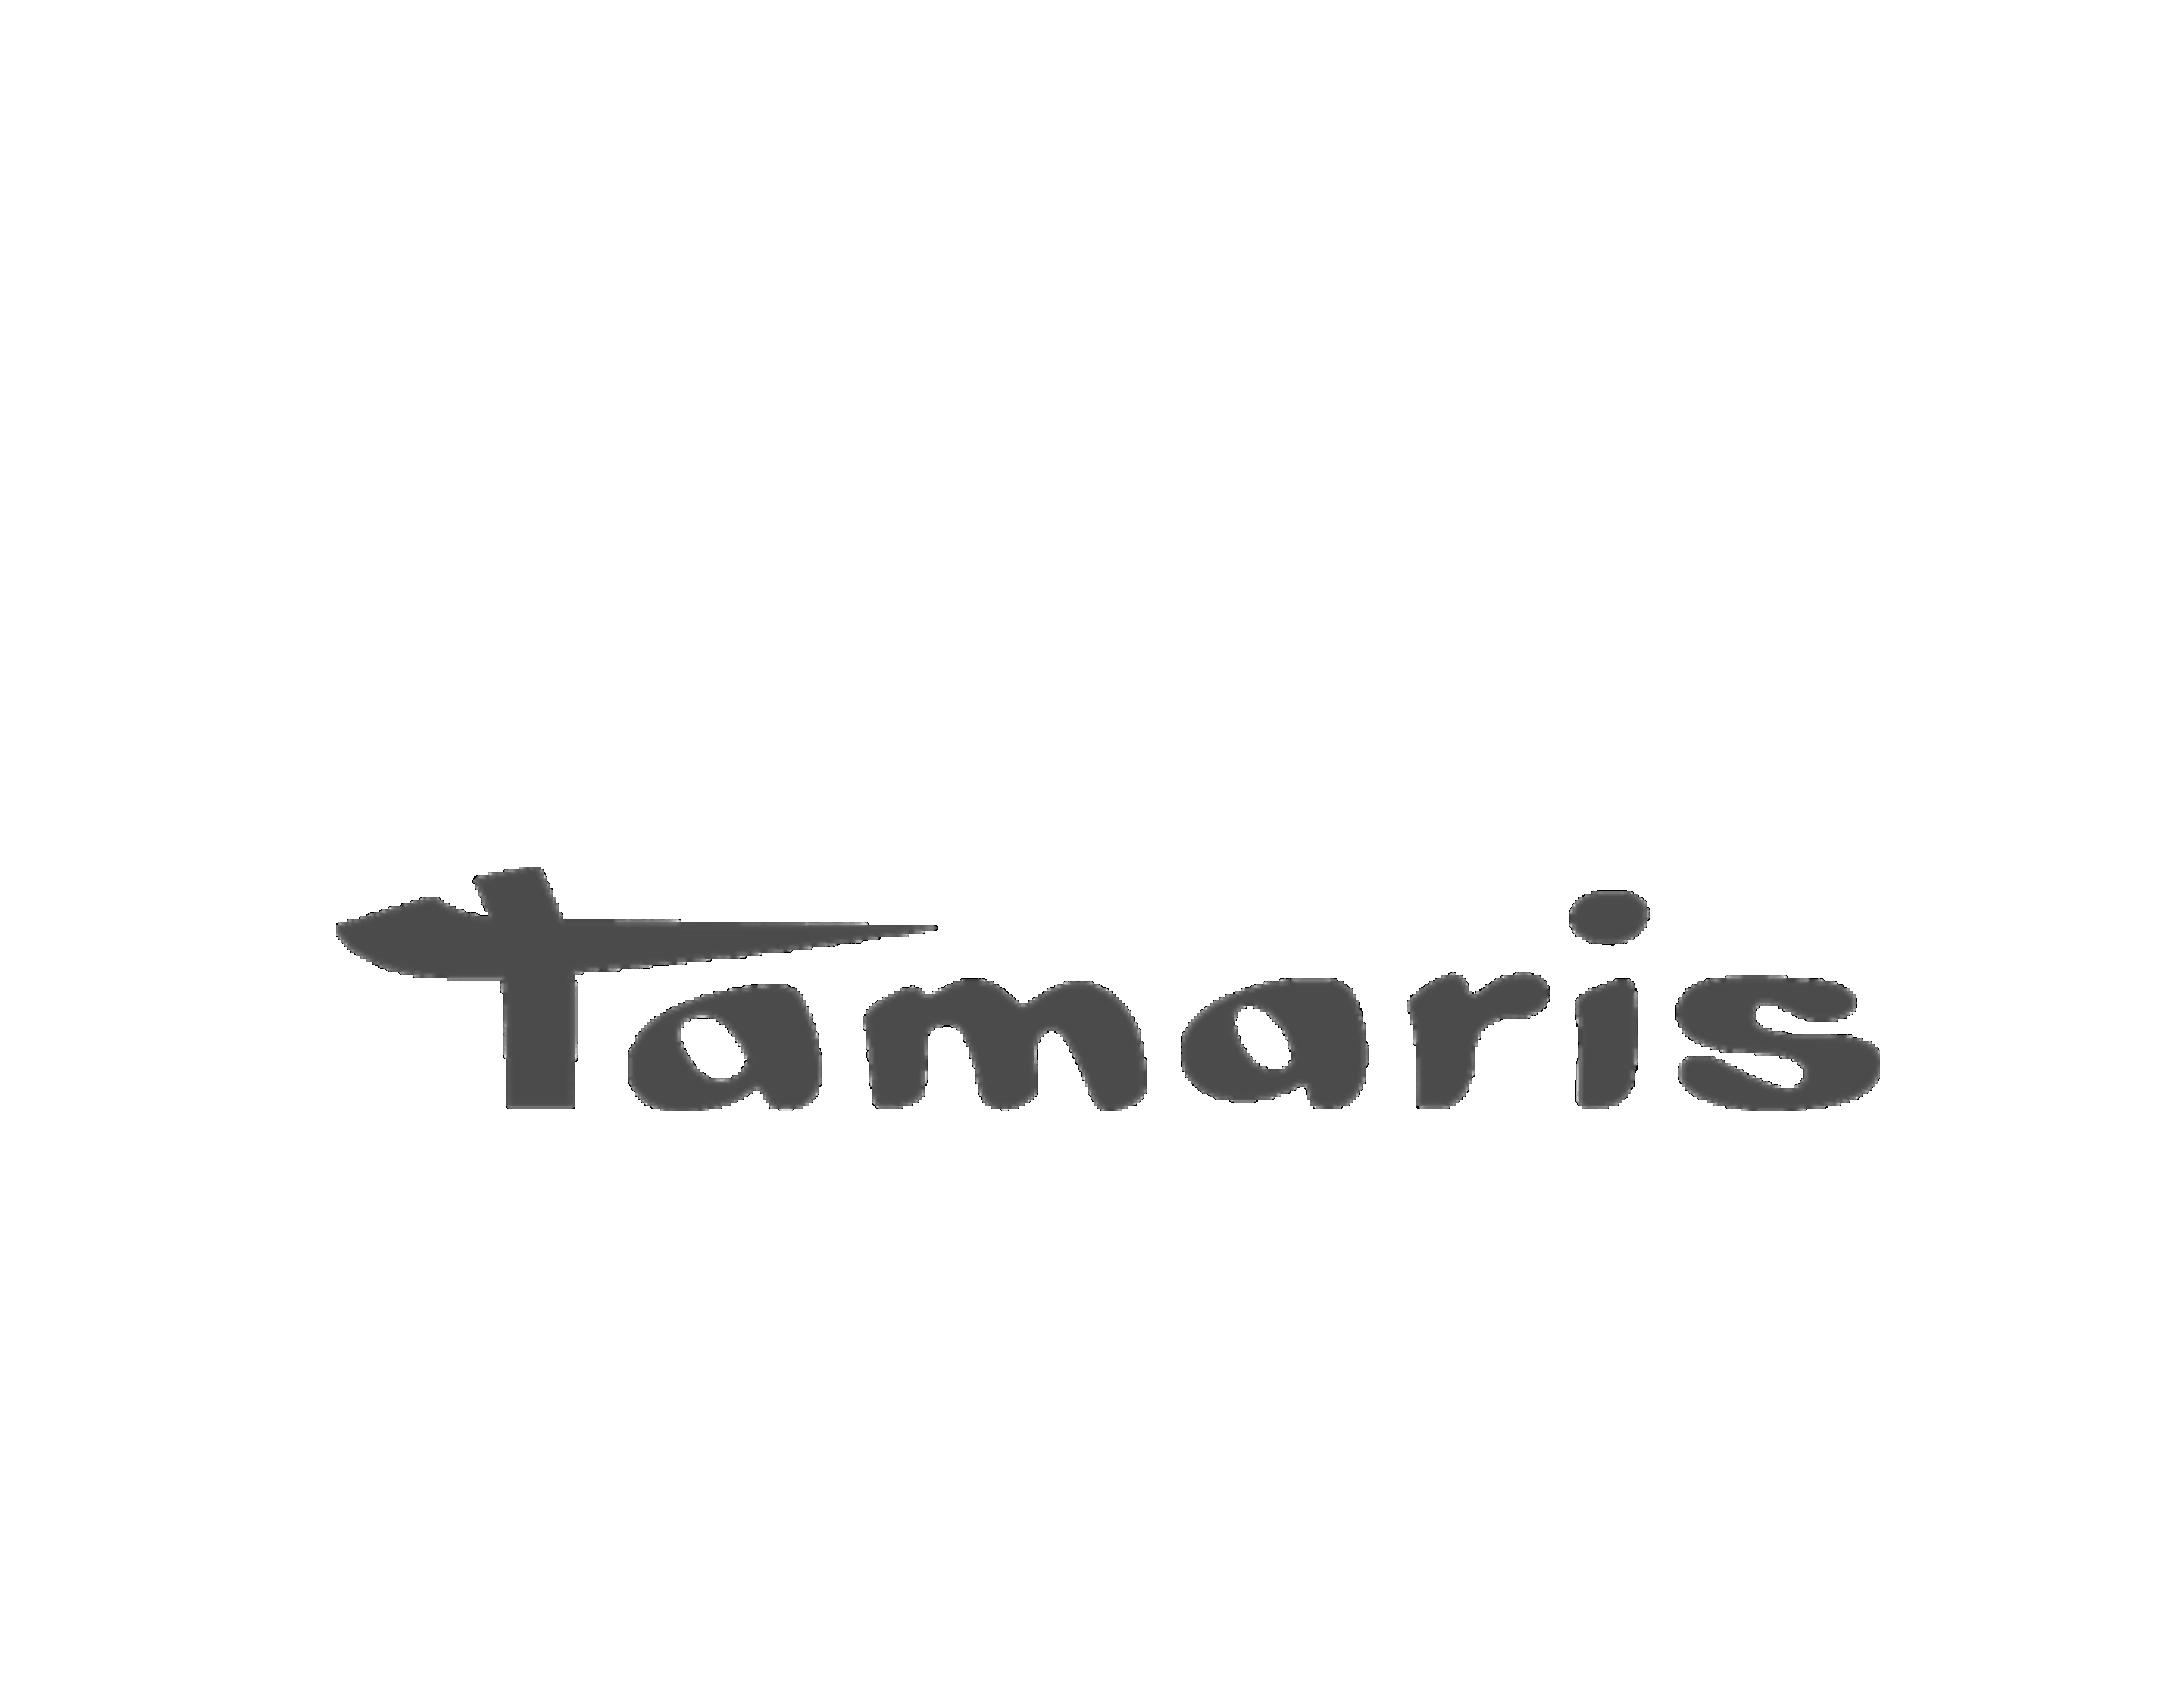 Tamaris - Wortmann Fashion Retail GmbH&Co.KG